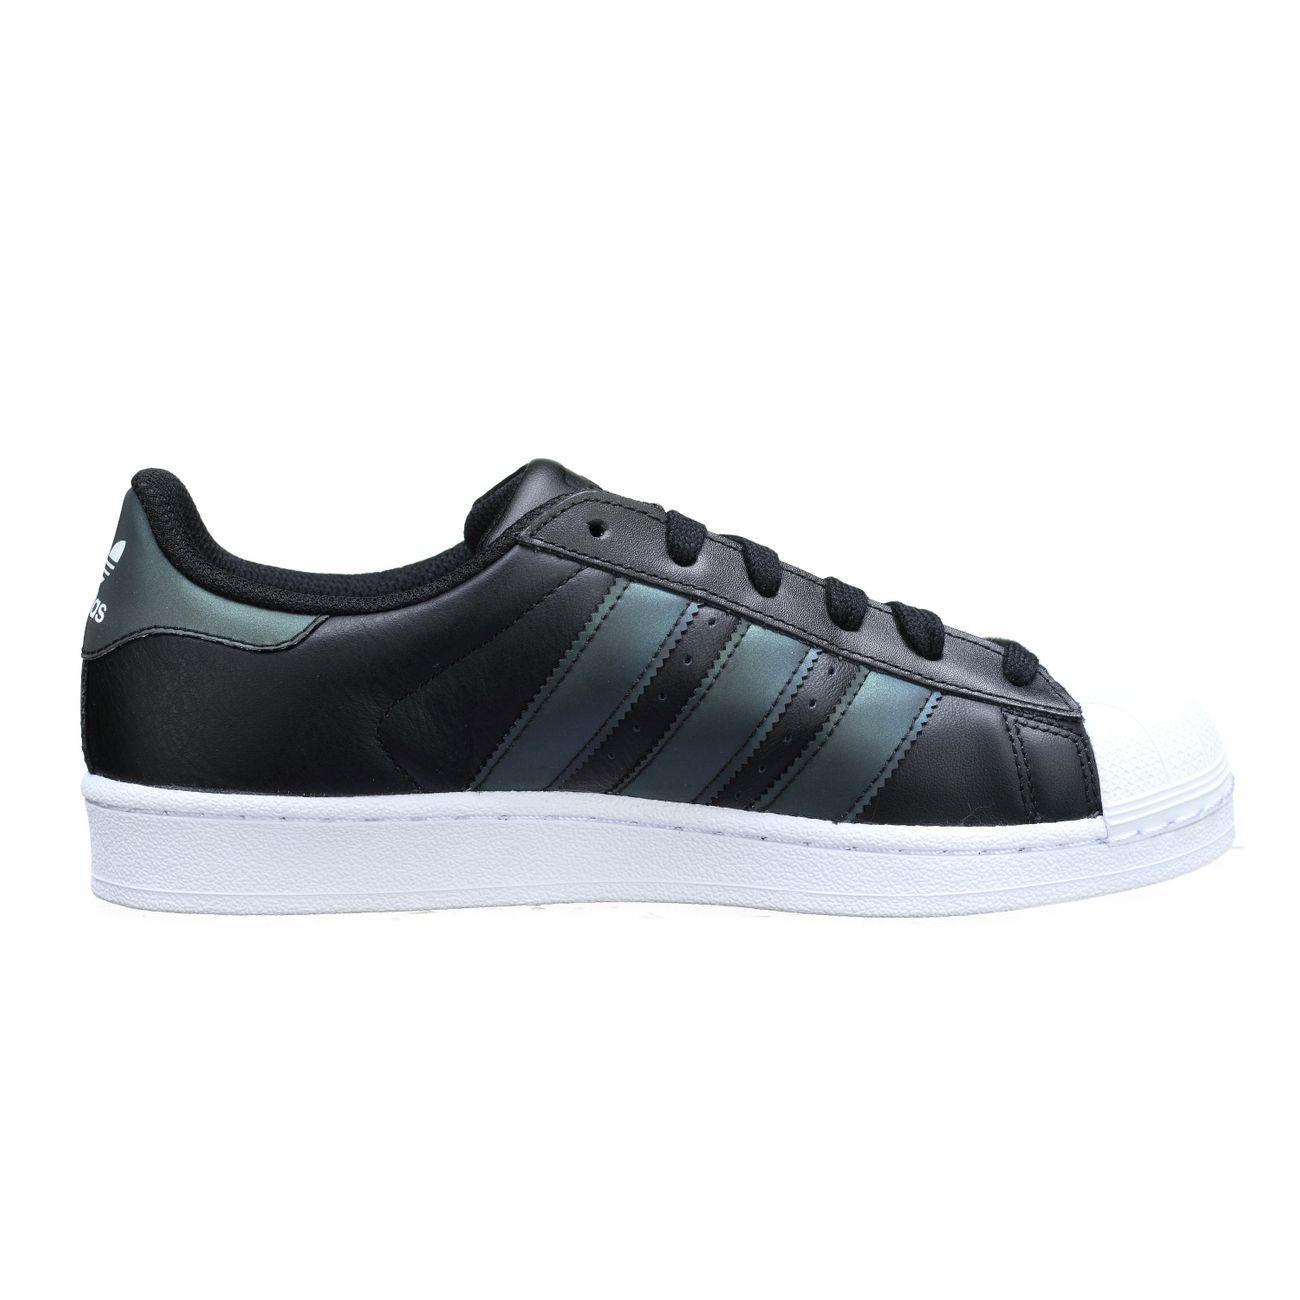 Homme Originals Adidas J Tennis Superstar L5AR4j3qcS